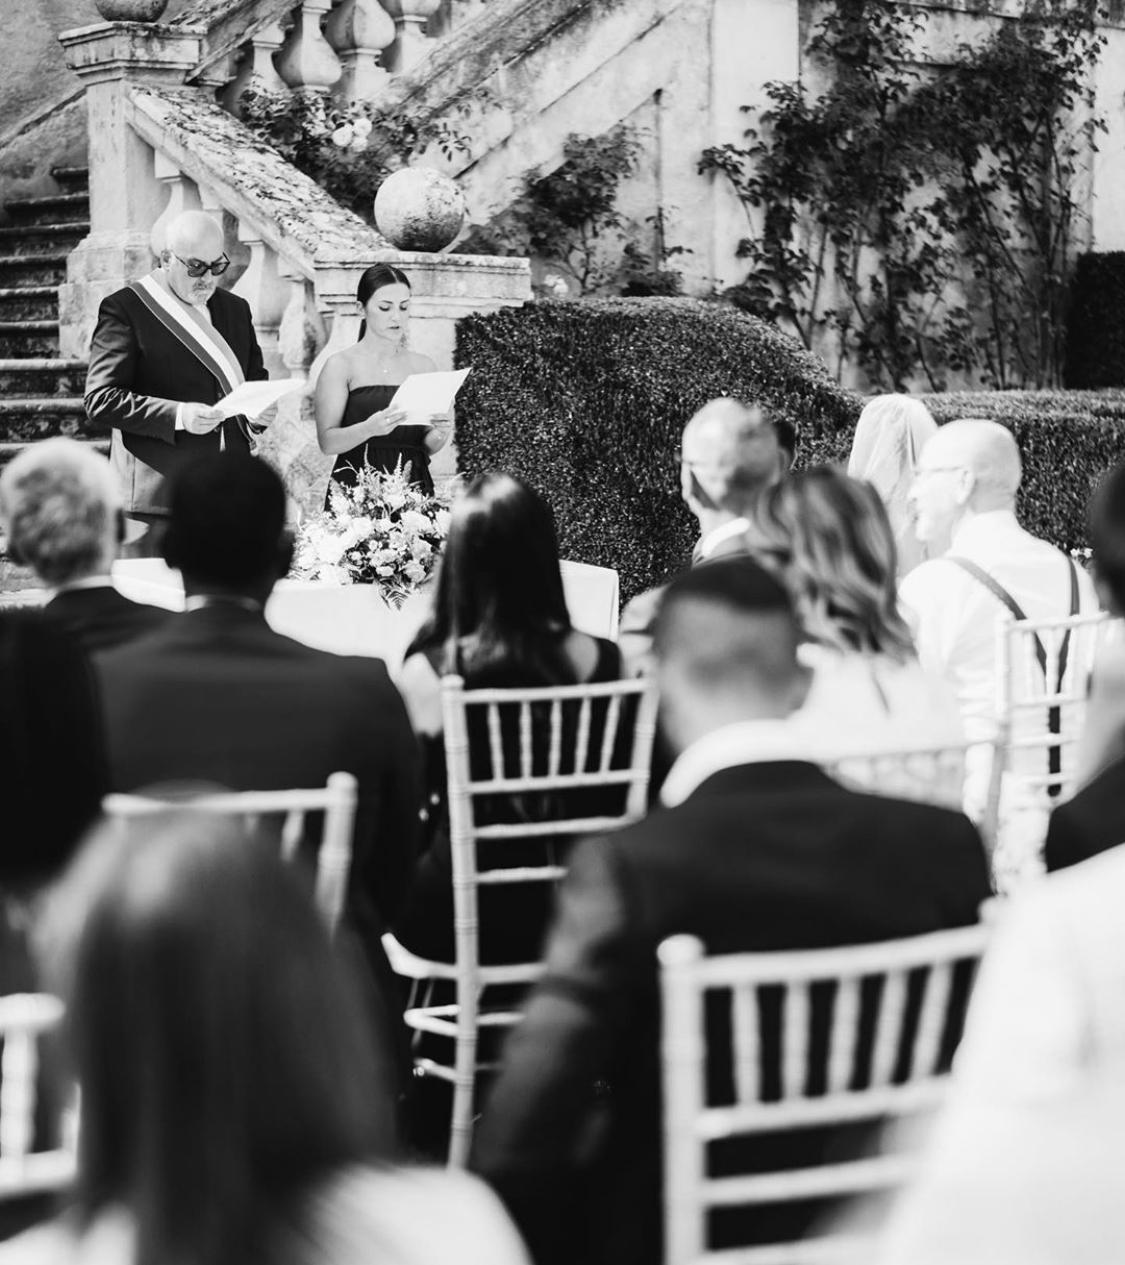 francesca manicardi wedding interpreter